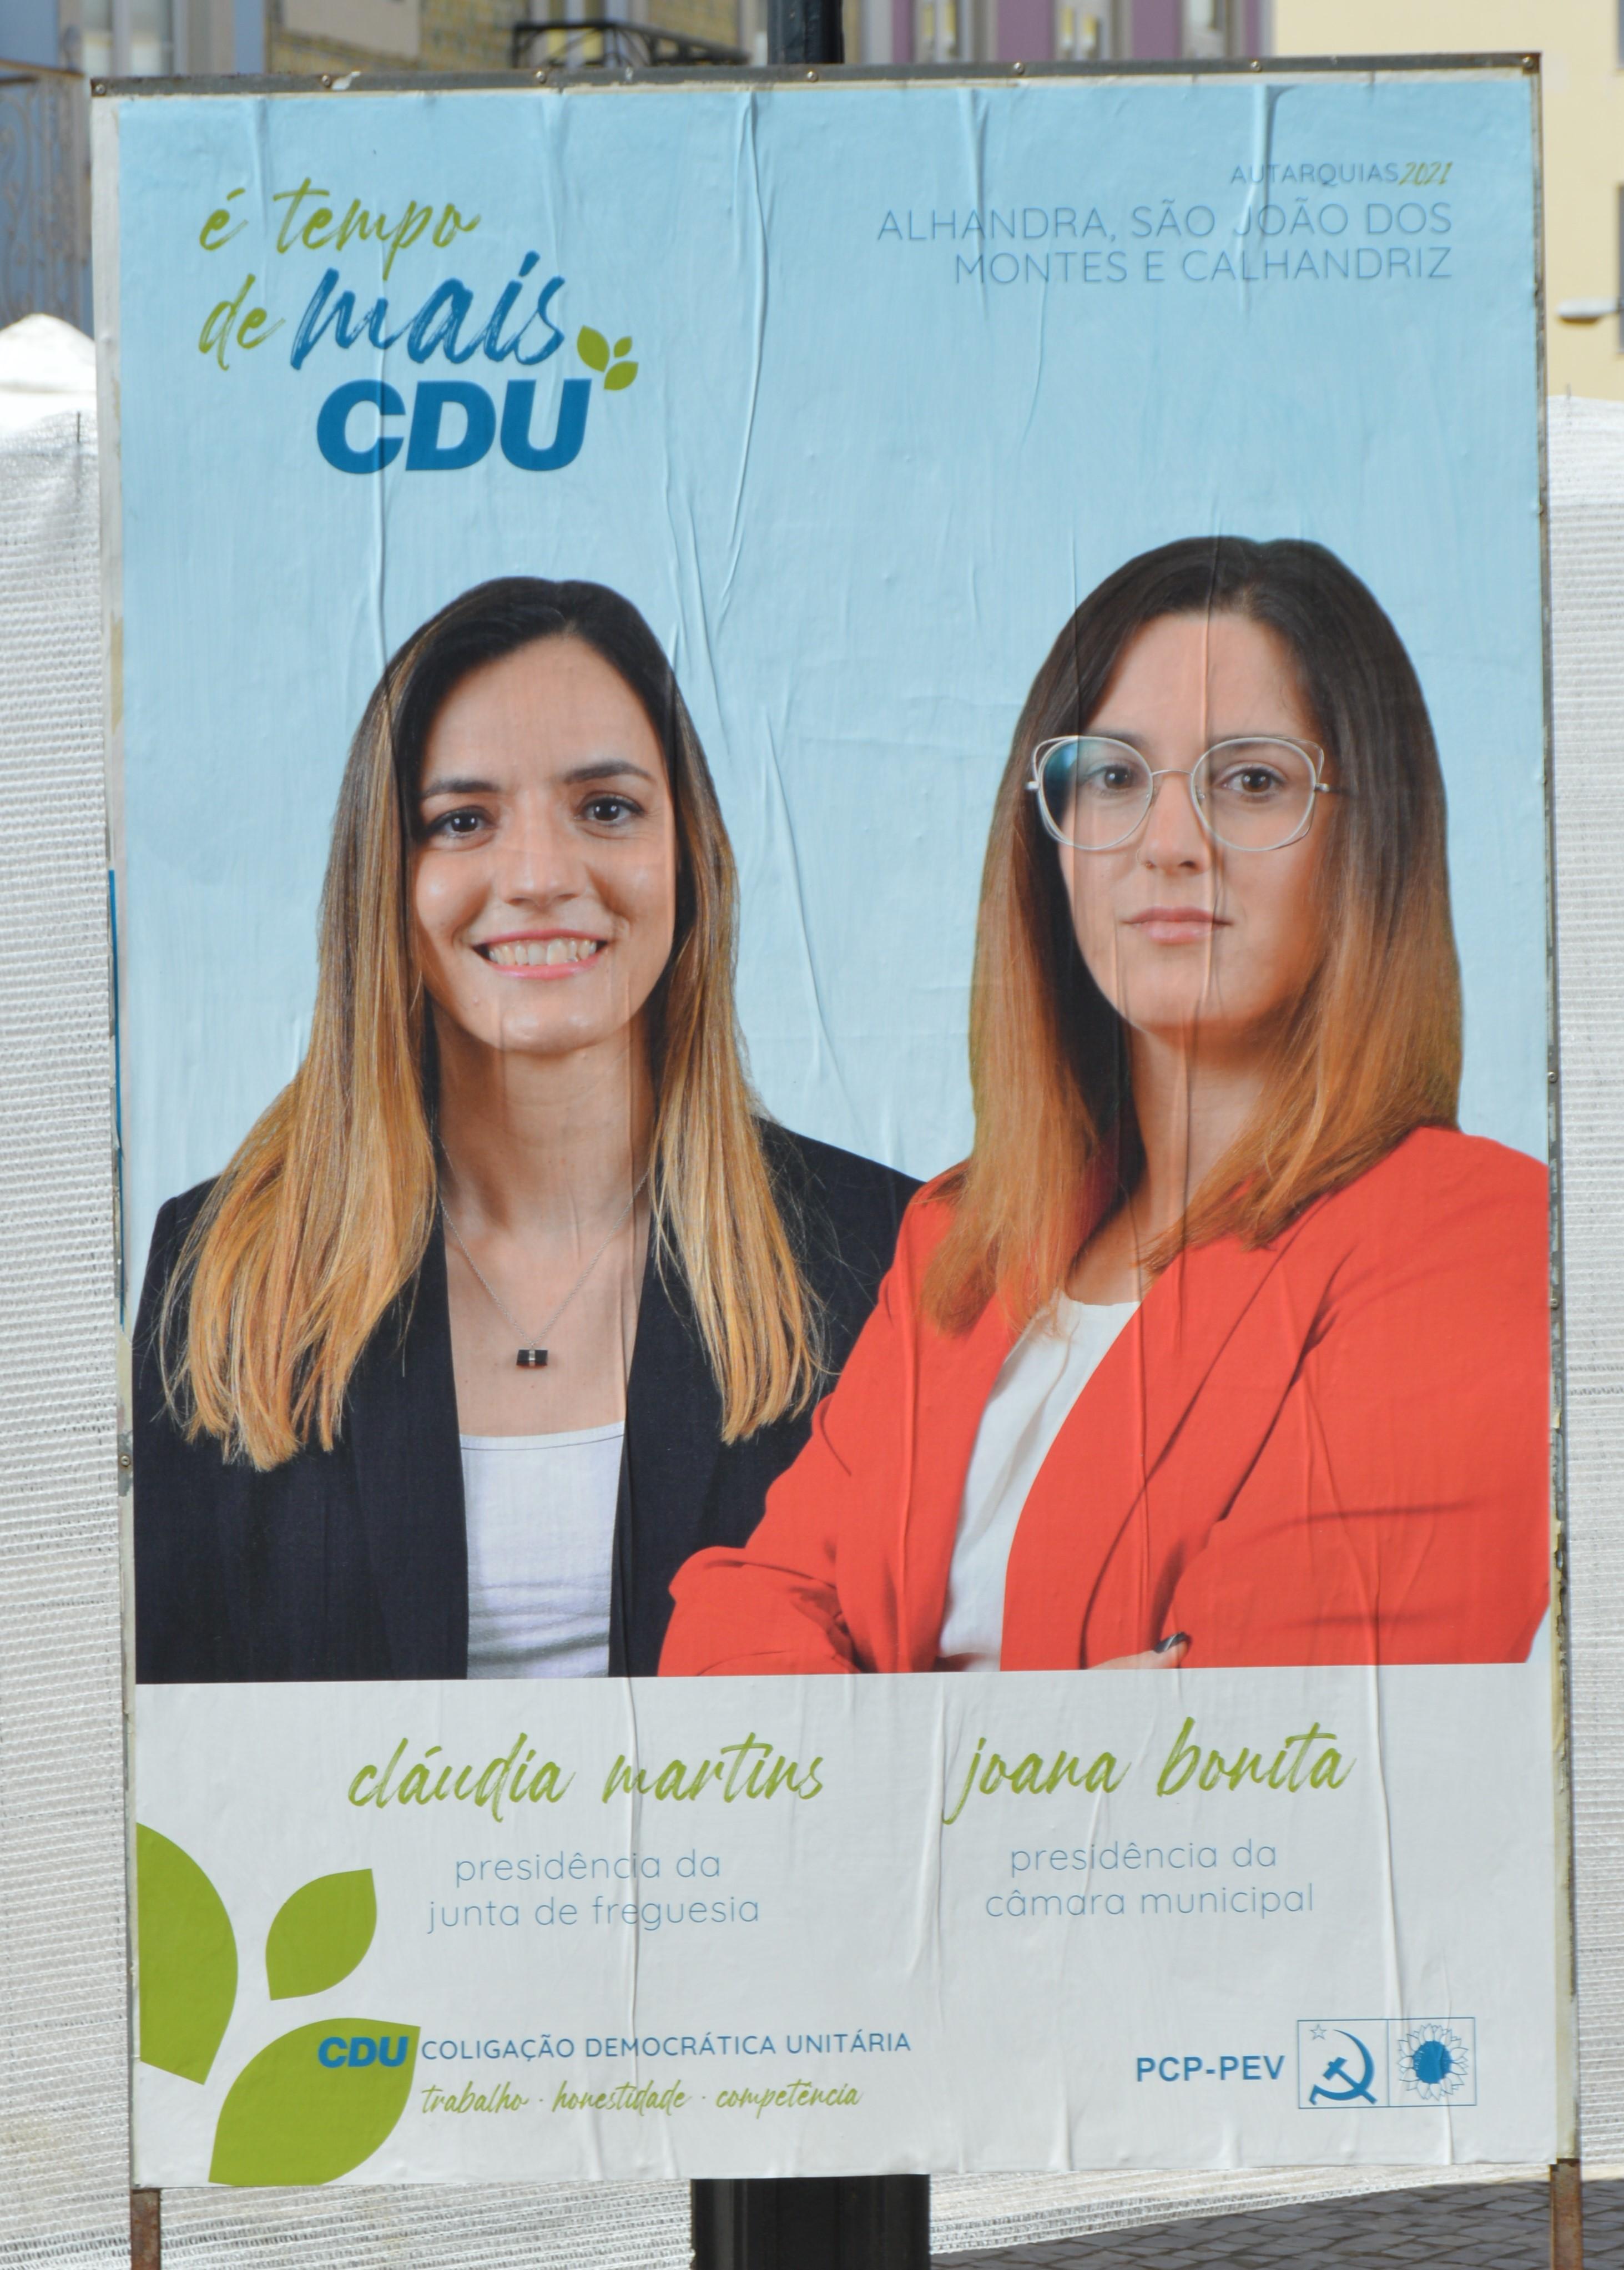 CDU_2021_VFXira_Alhandra